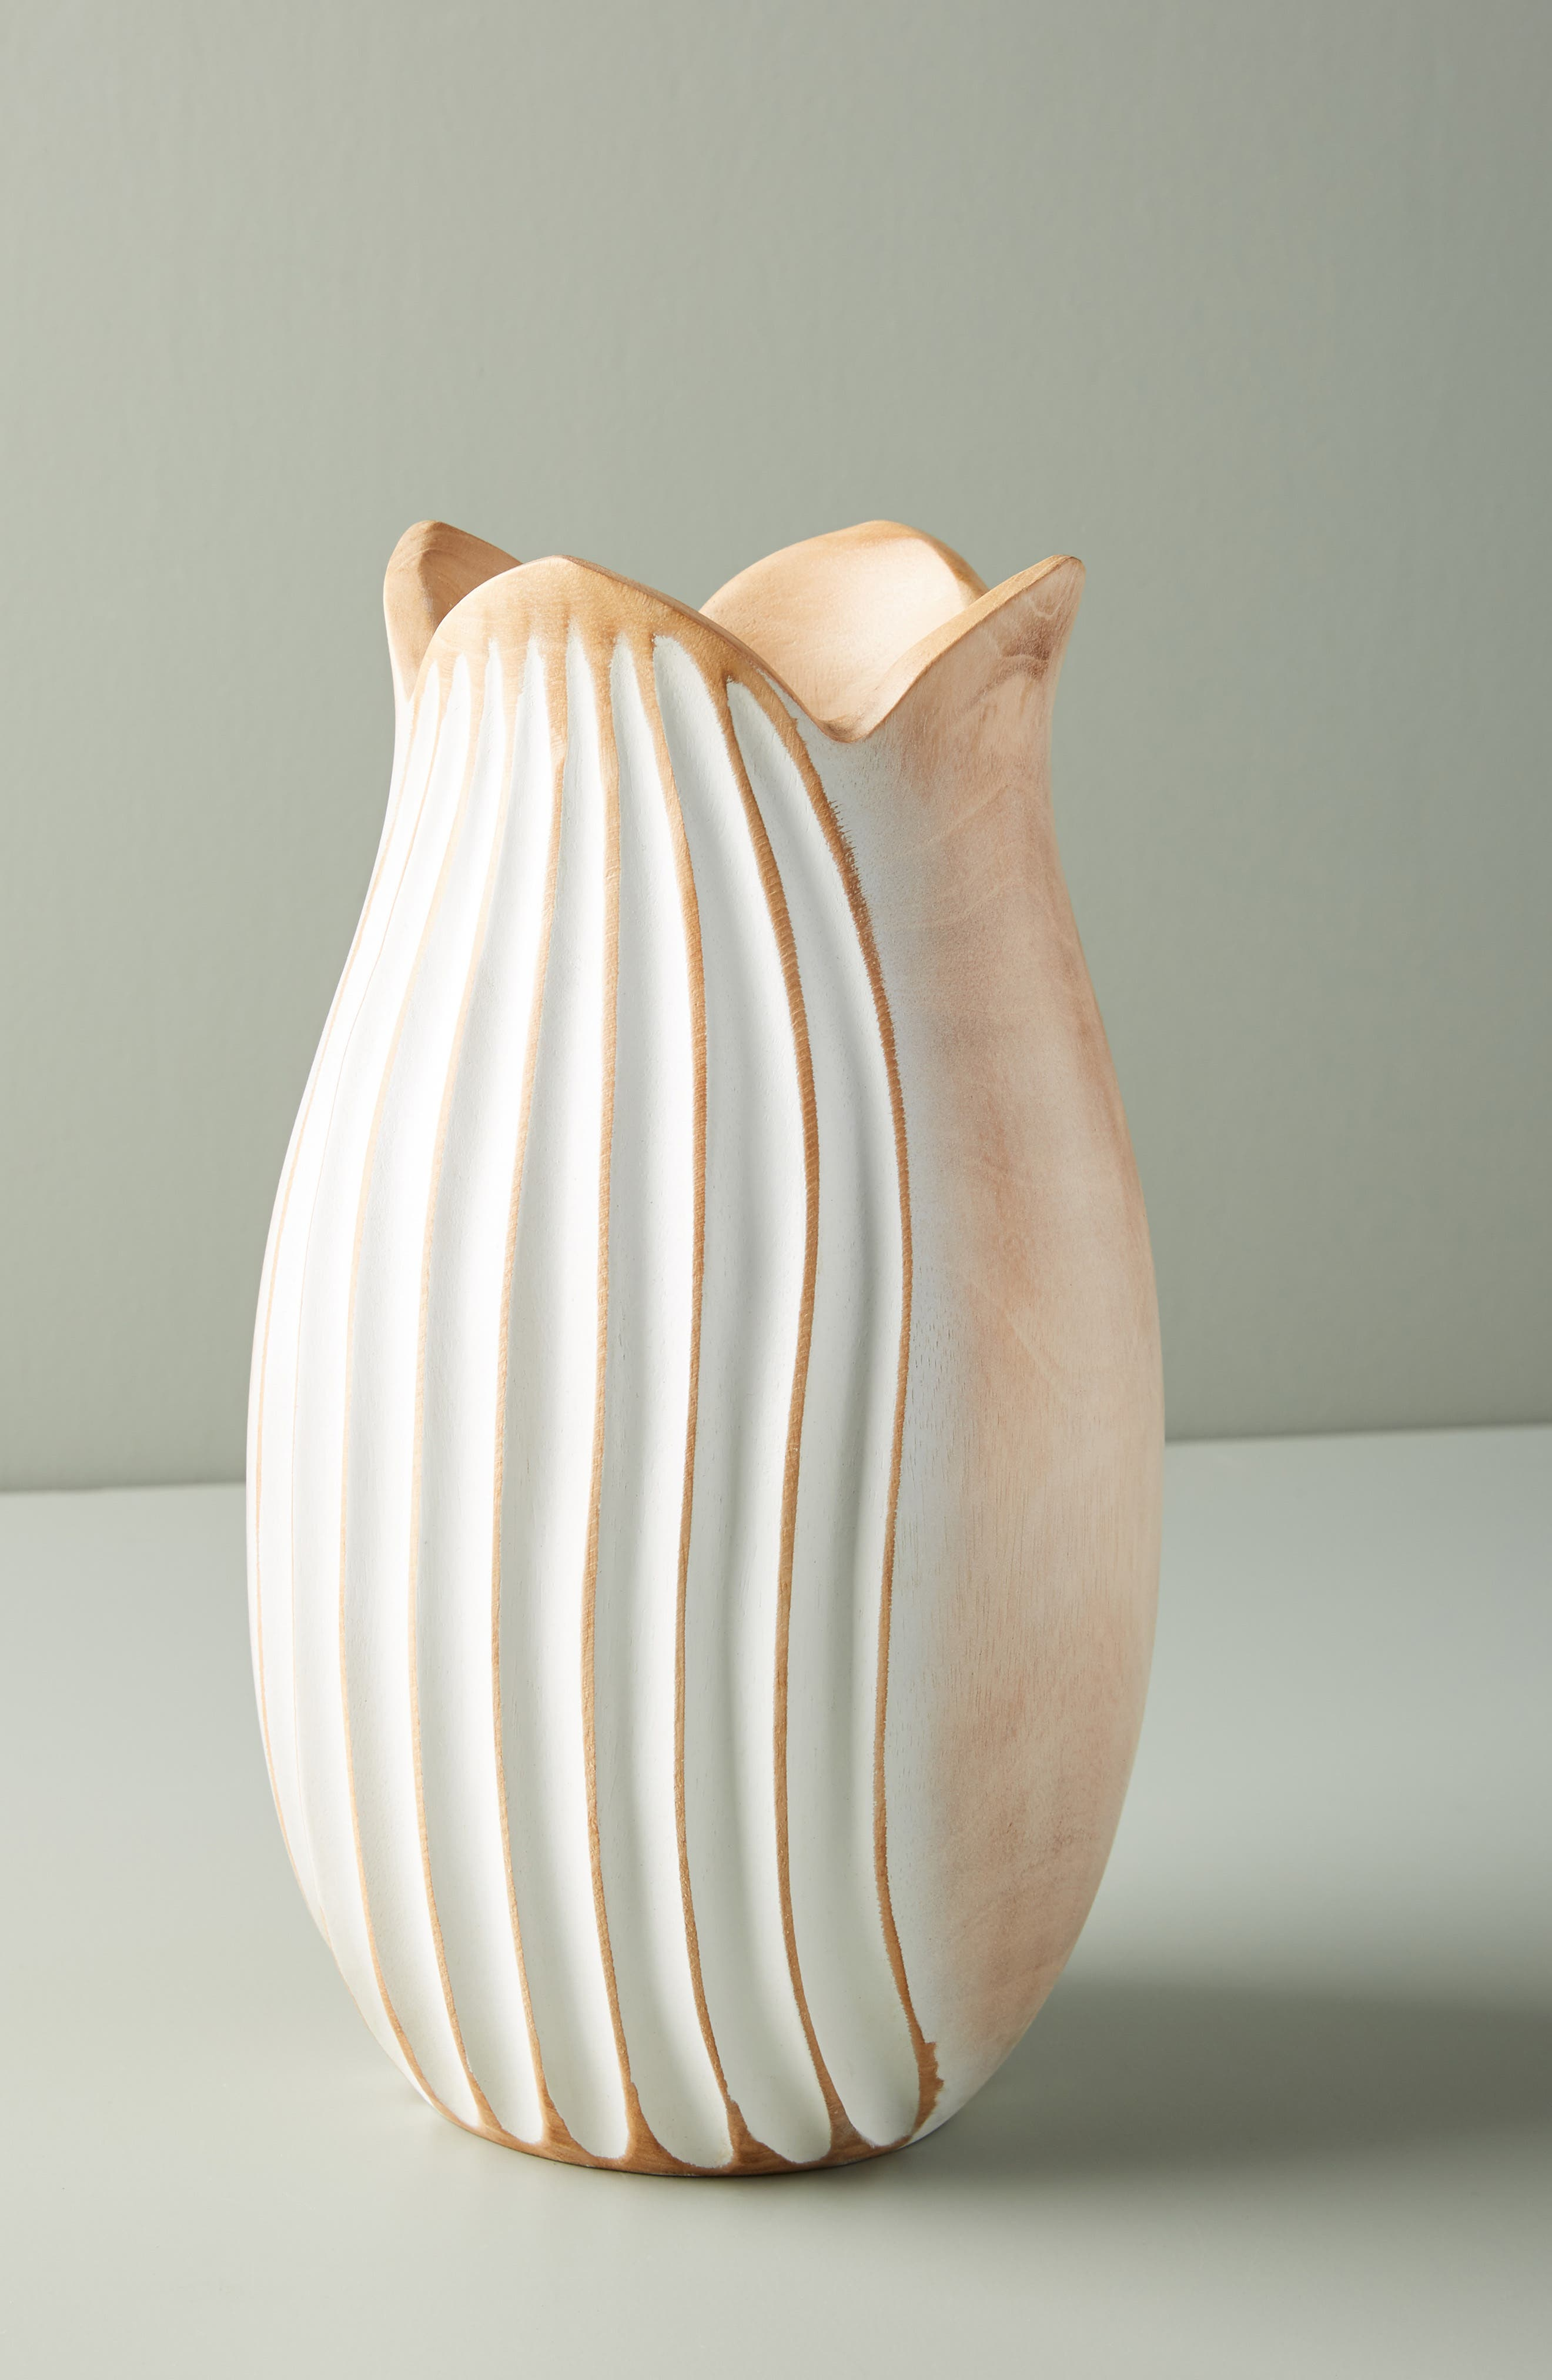 Medium Lotus Mango Wood Vase,                             Main thumbnail 1, color,                             WHITE